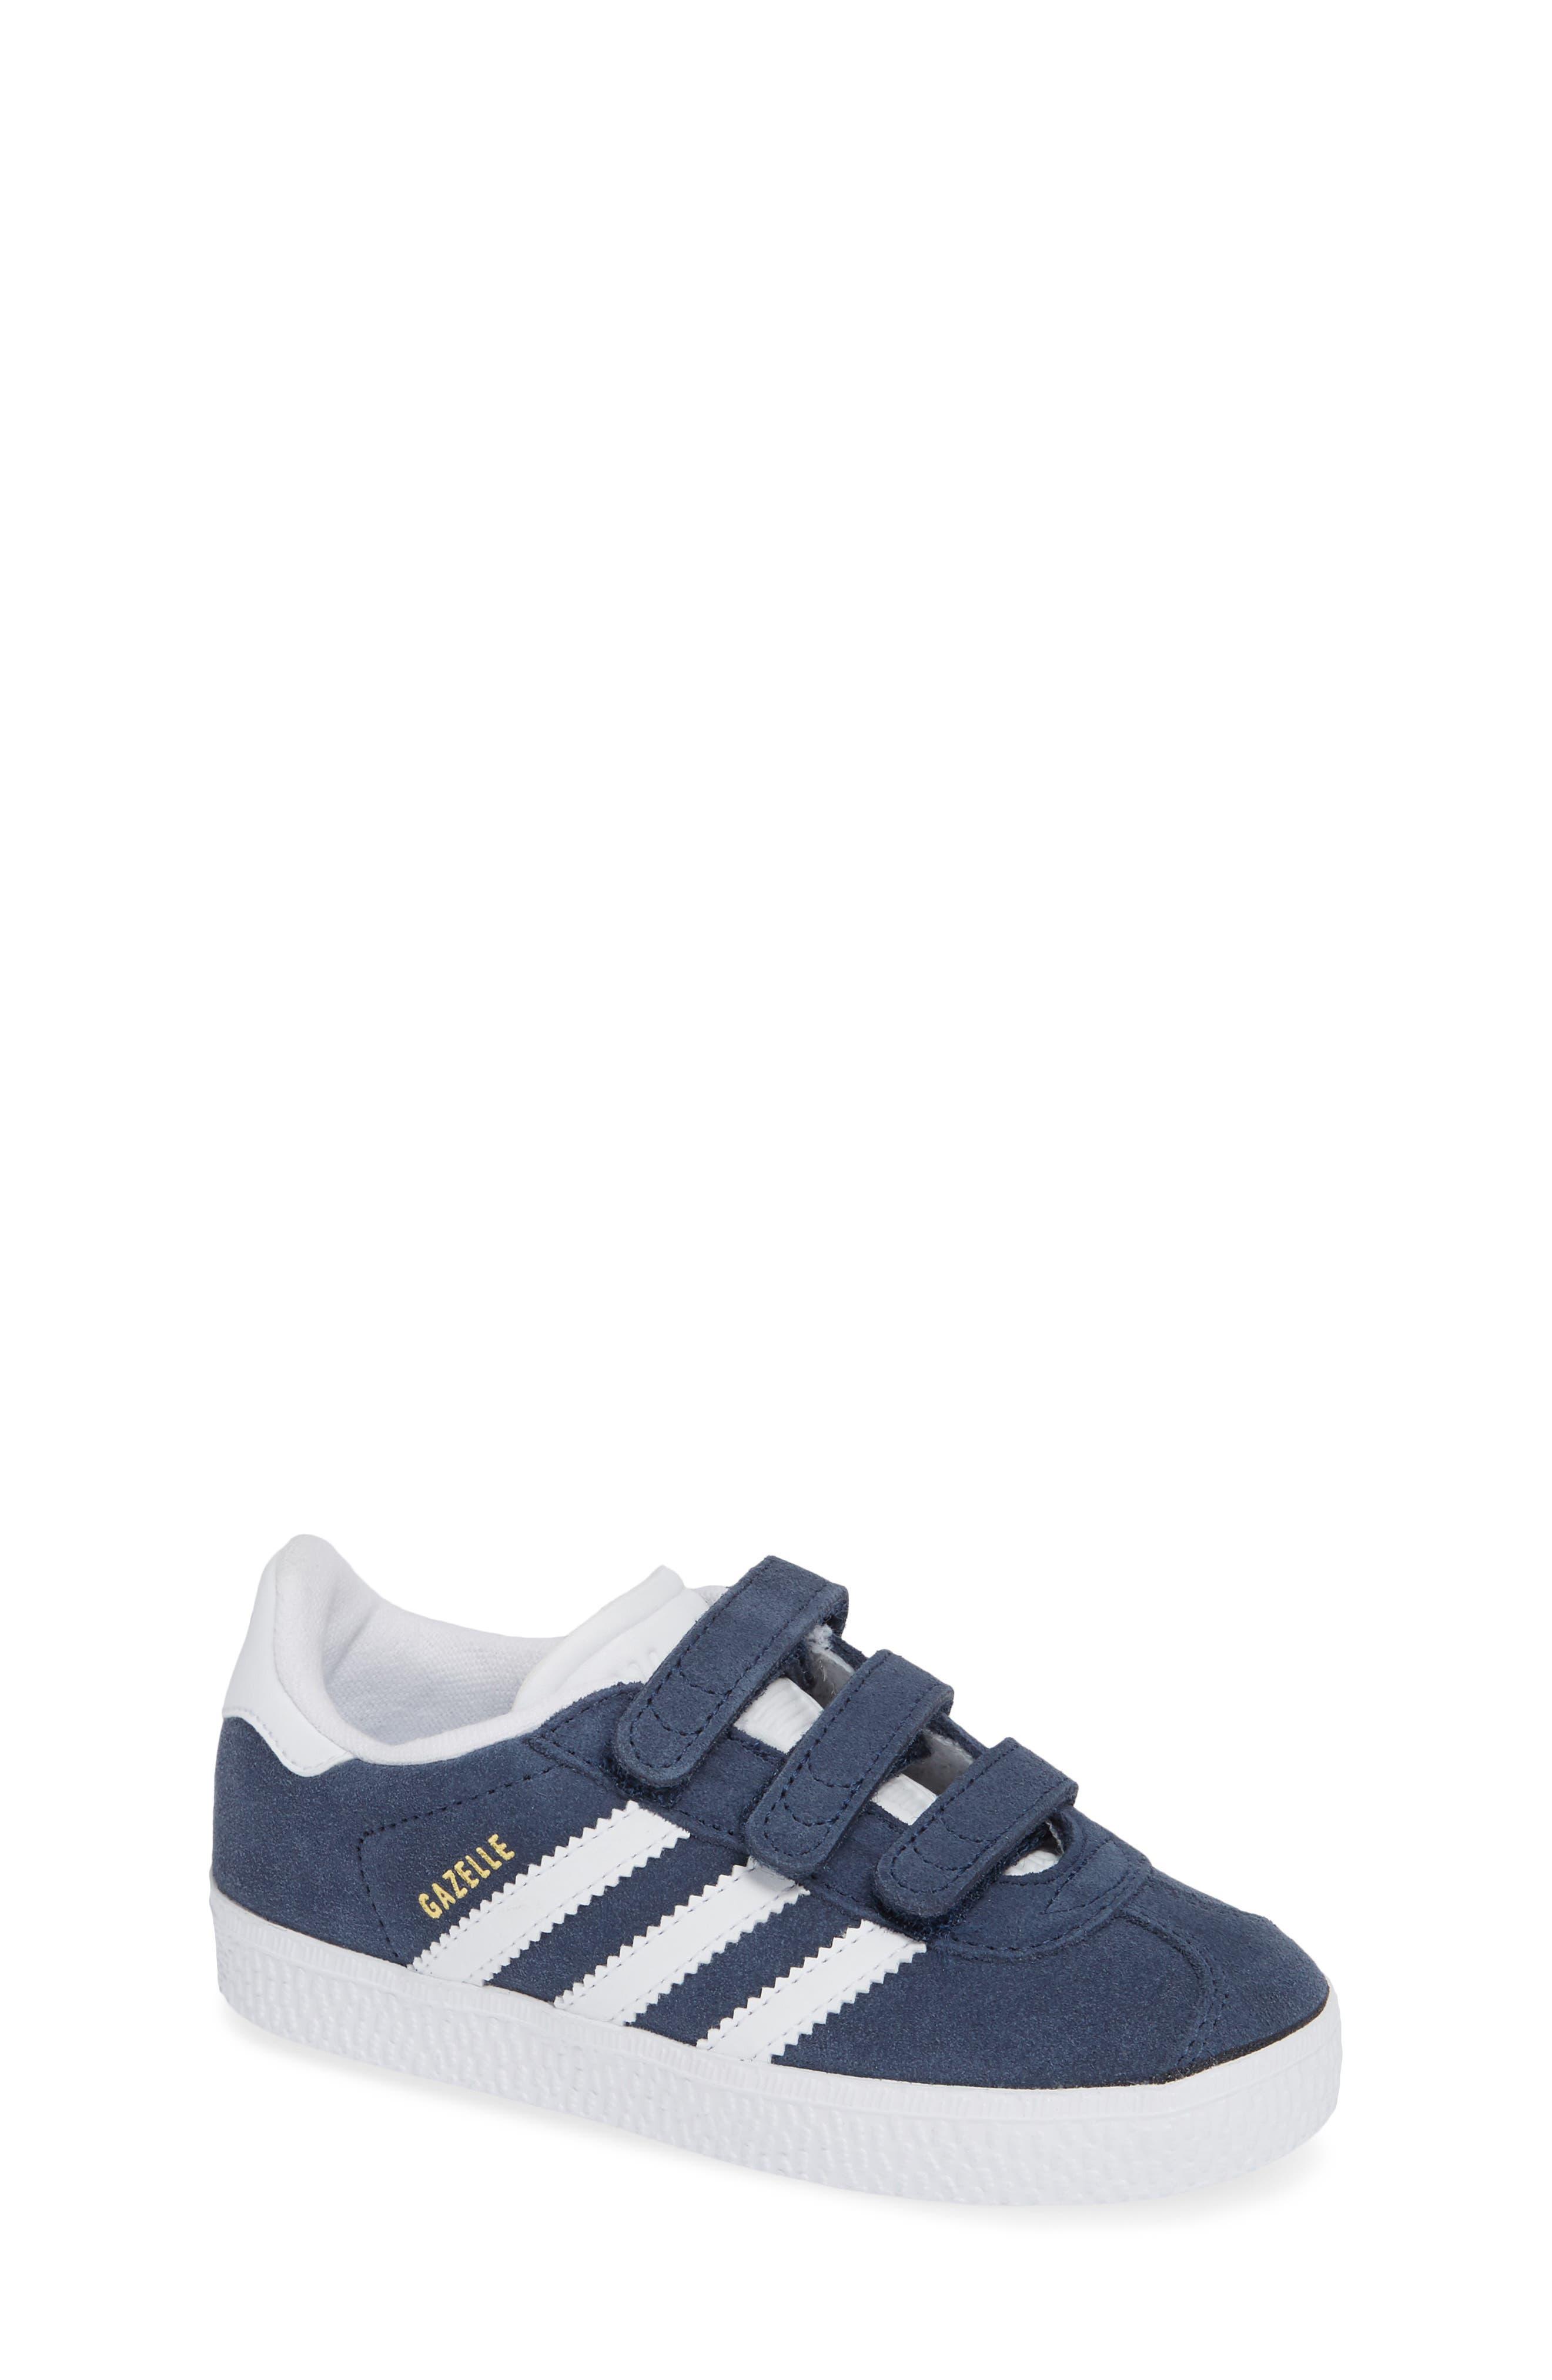 ADIDAS, Gazelle Sneaker, Main thumbnail 1, color, NAVY/ WHITE